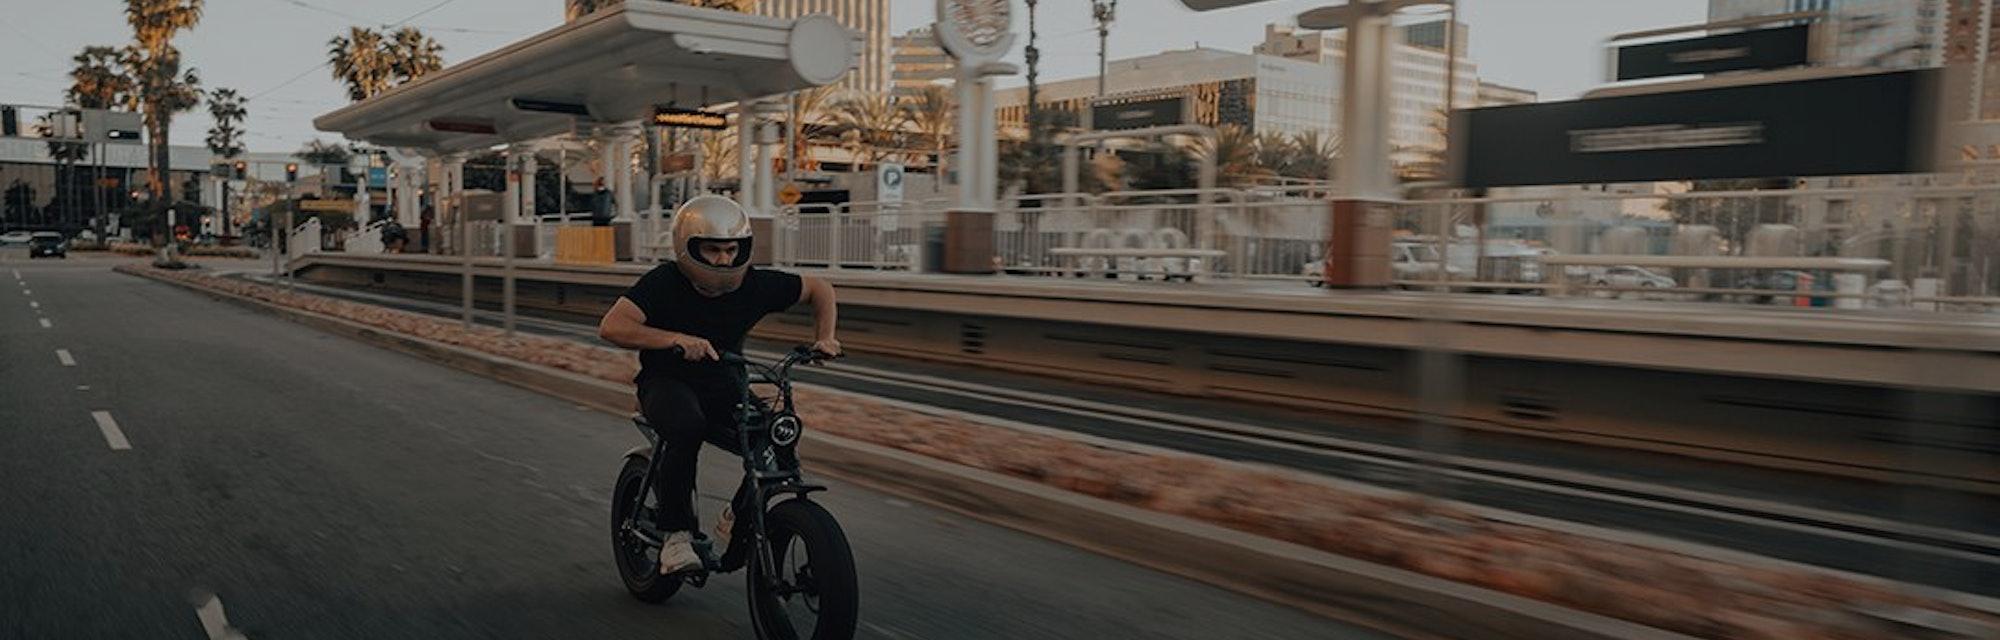 Super73 e-bike riding on a street.